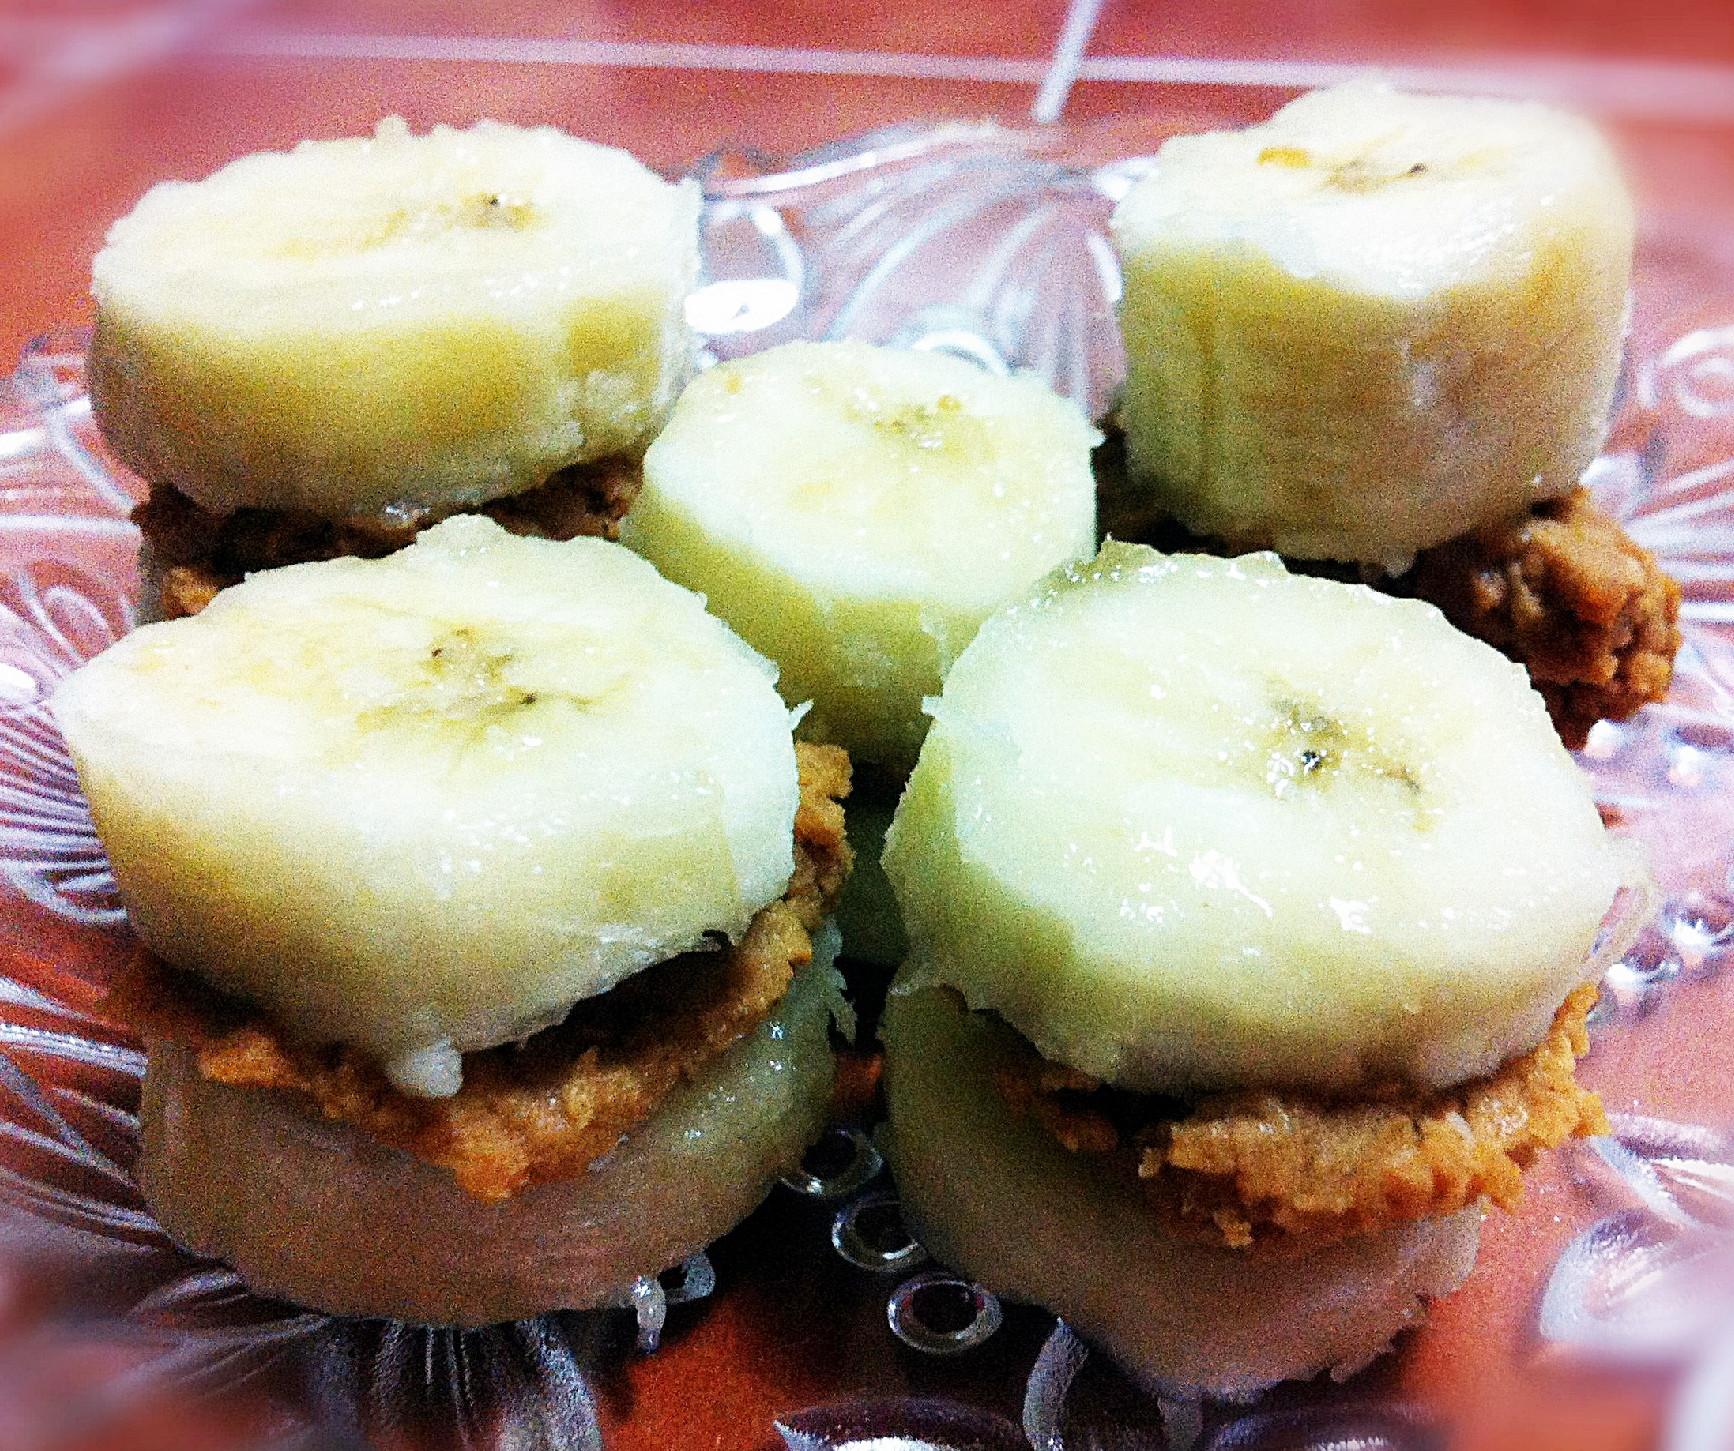 Healthy Banana Desserts Easy  Healthy Dessert Ideas Banana and Peanut Butter Bites